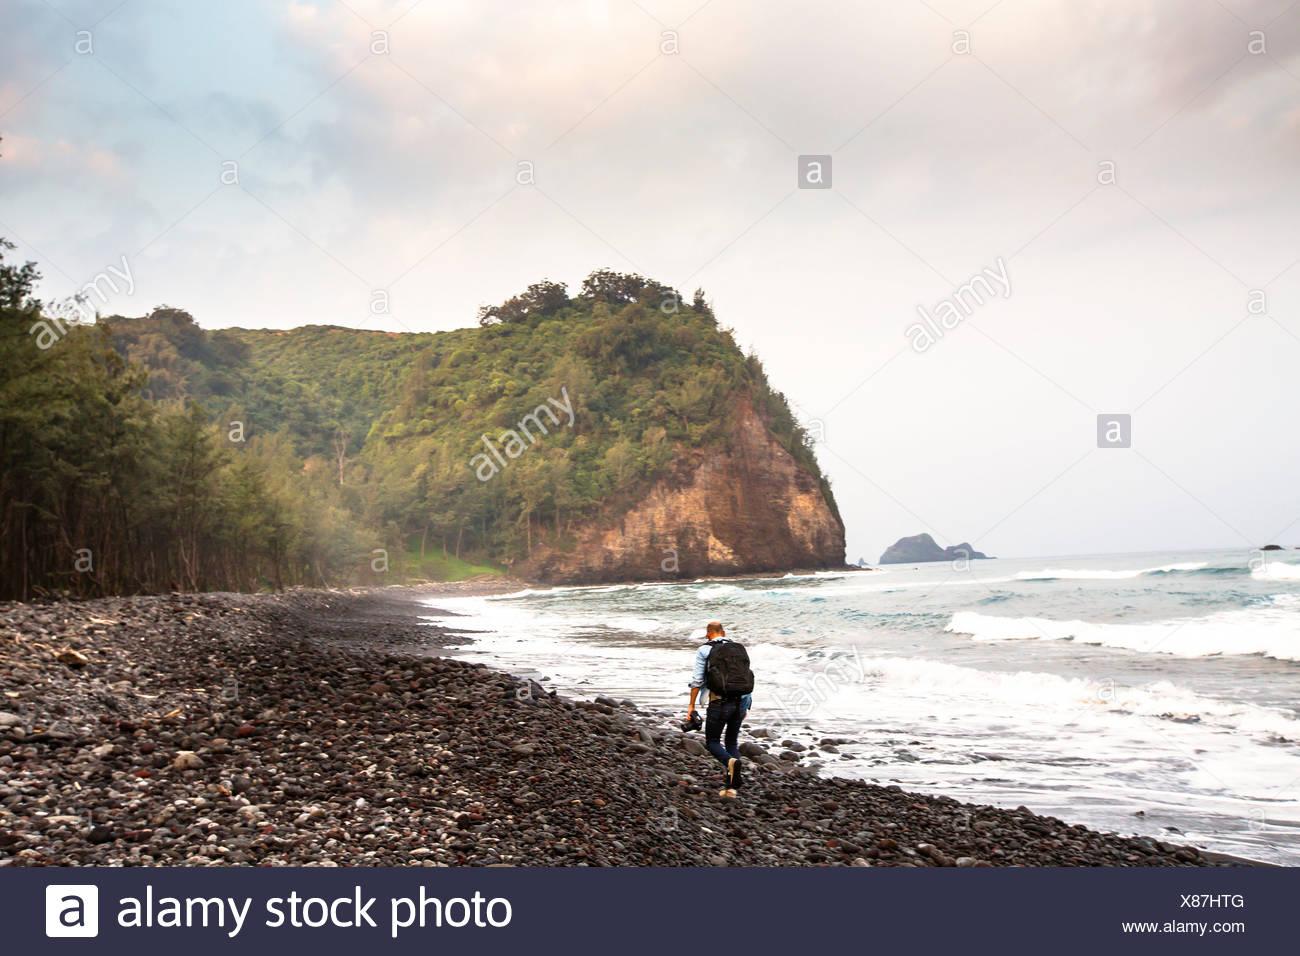 Mid adult man hiking along beach - Stock Image